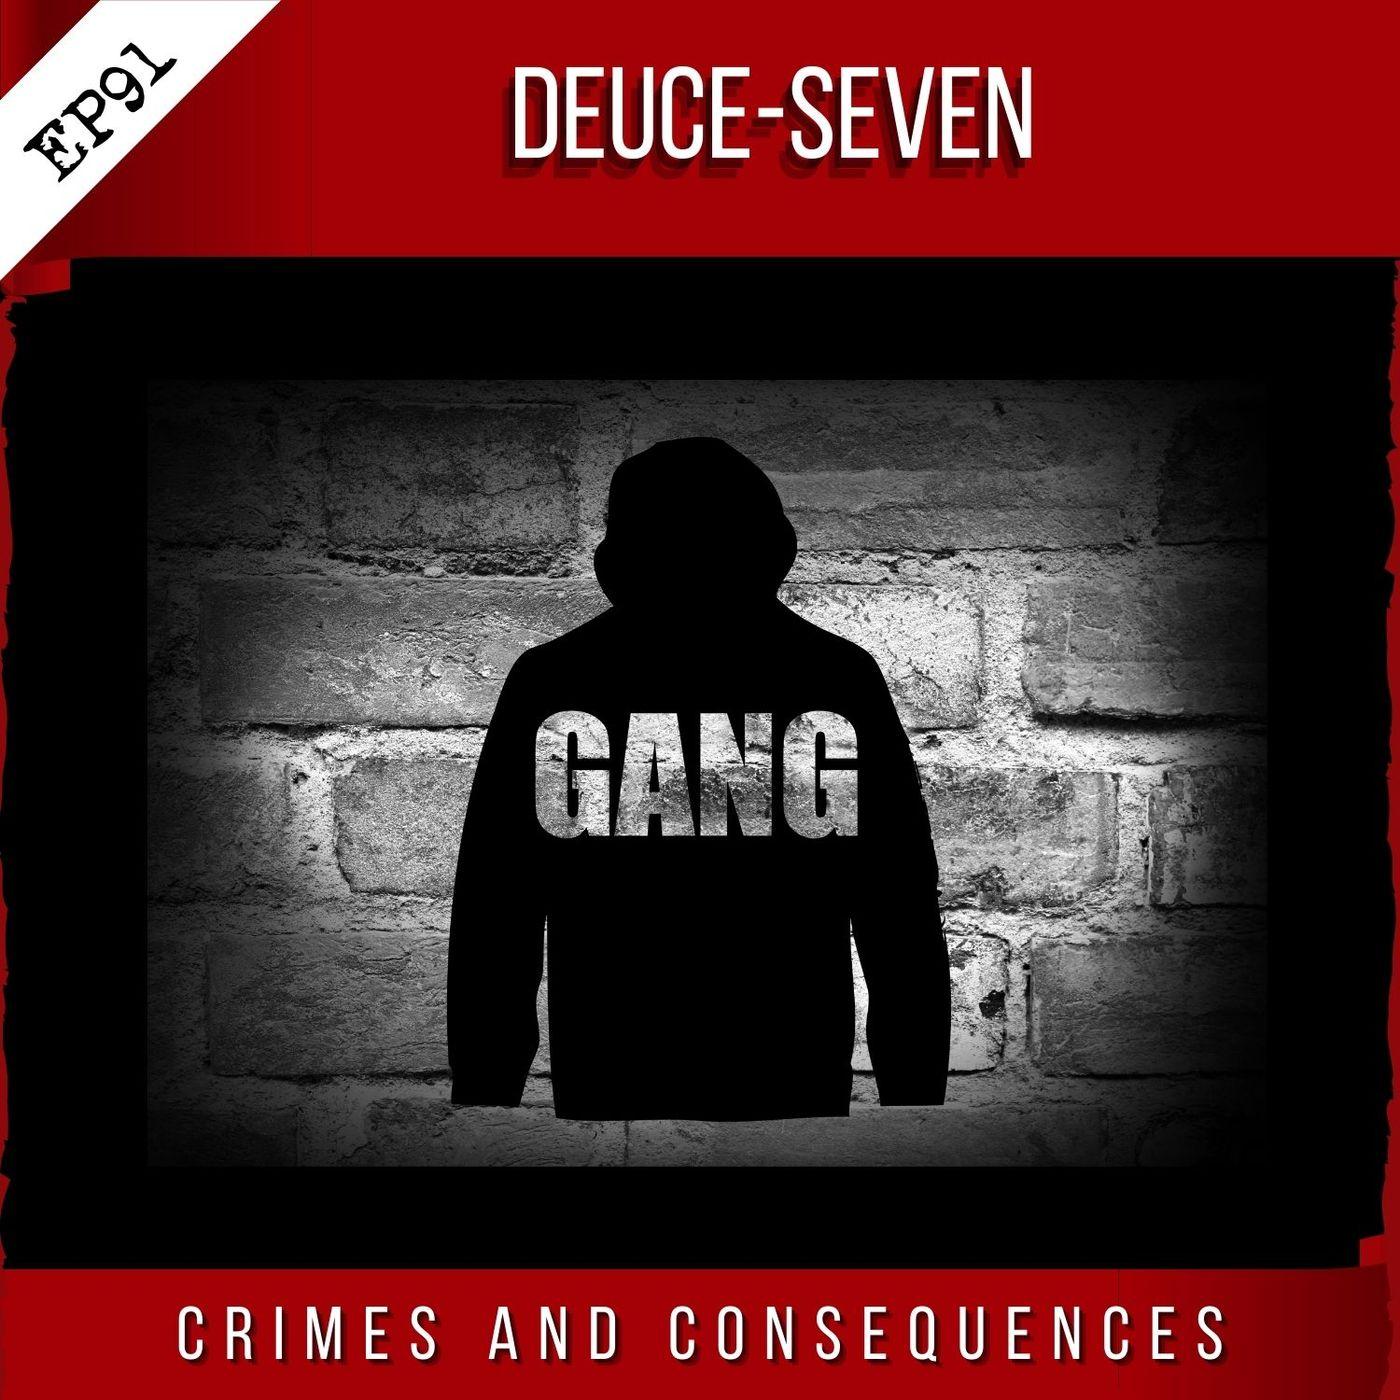 EP91: Deuce-Seven's Barbaric Murder of Brandy Duvall